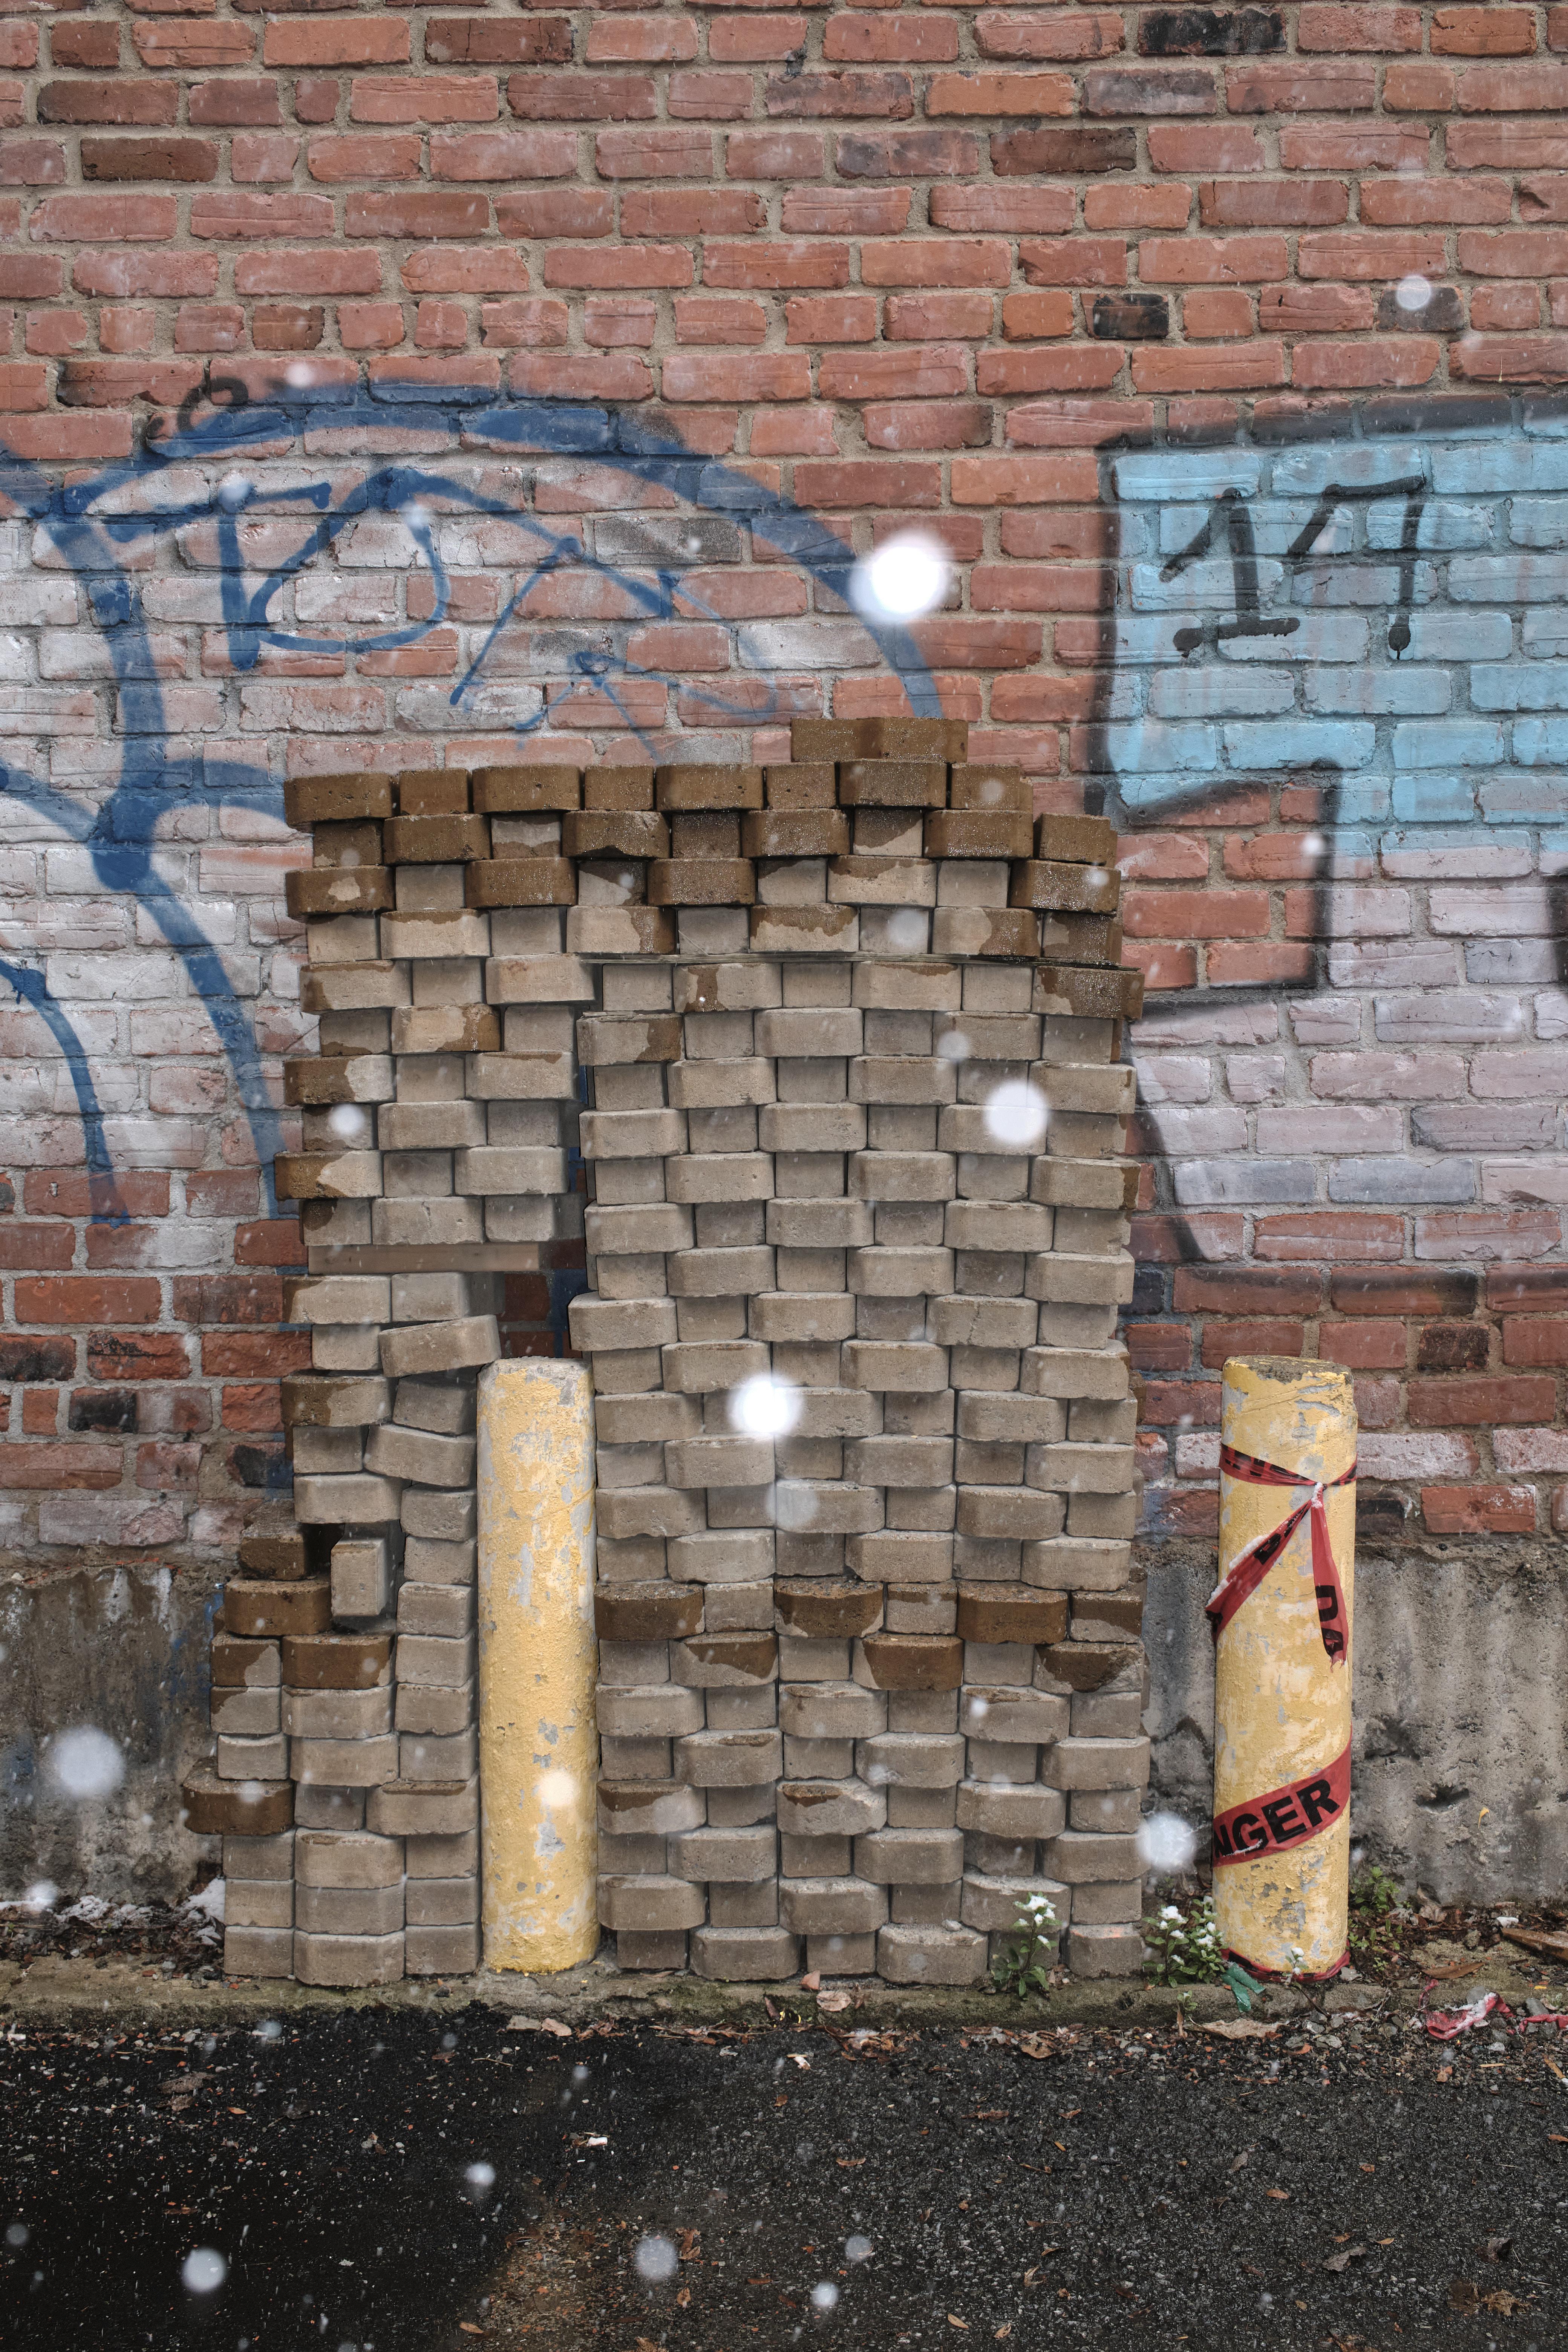 02_dean_garlick_bricks